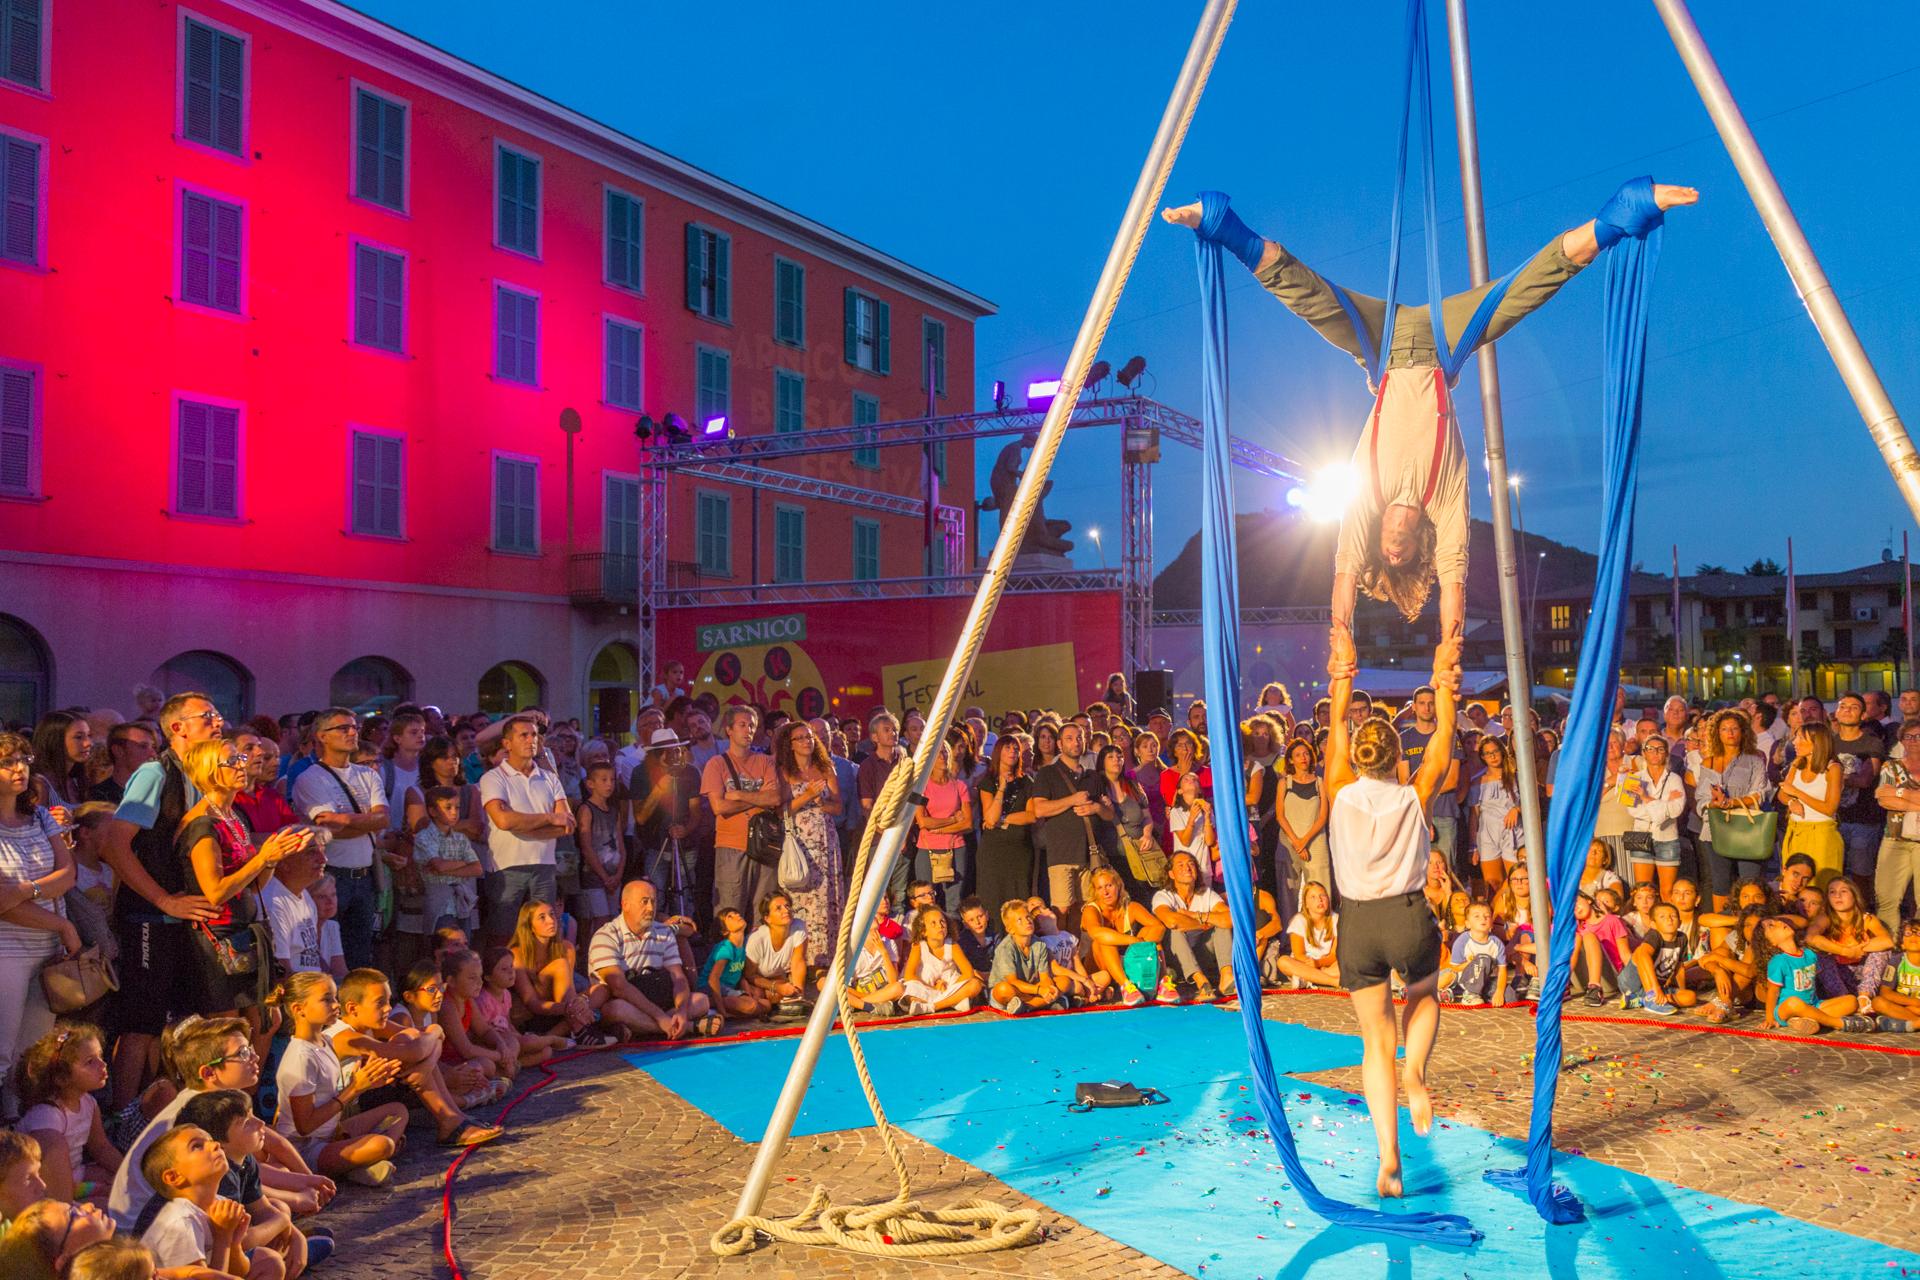 Sarnico Busker Festival 2017 19